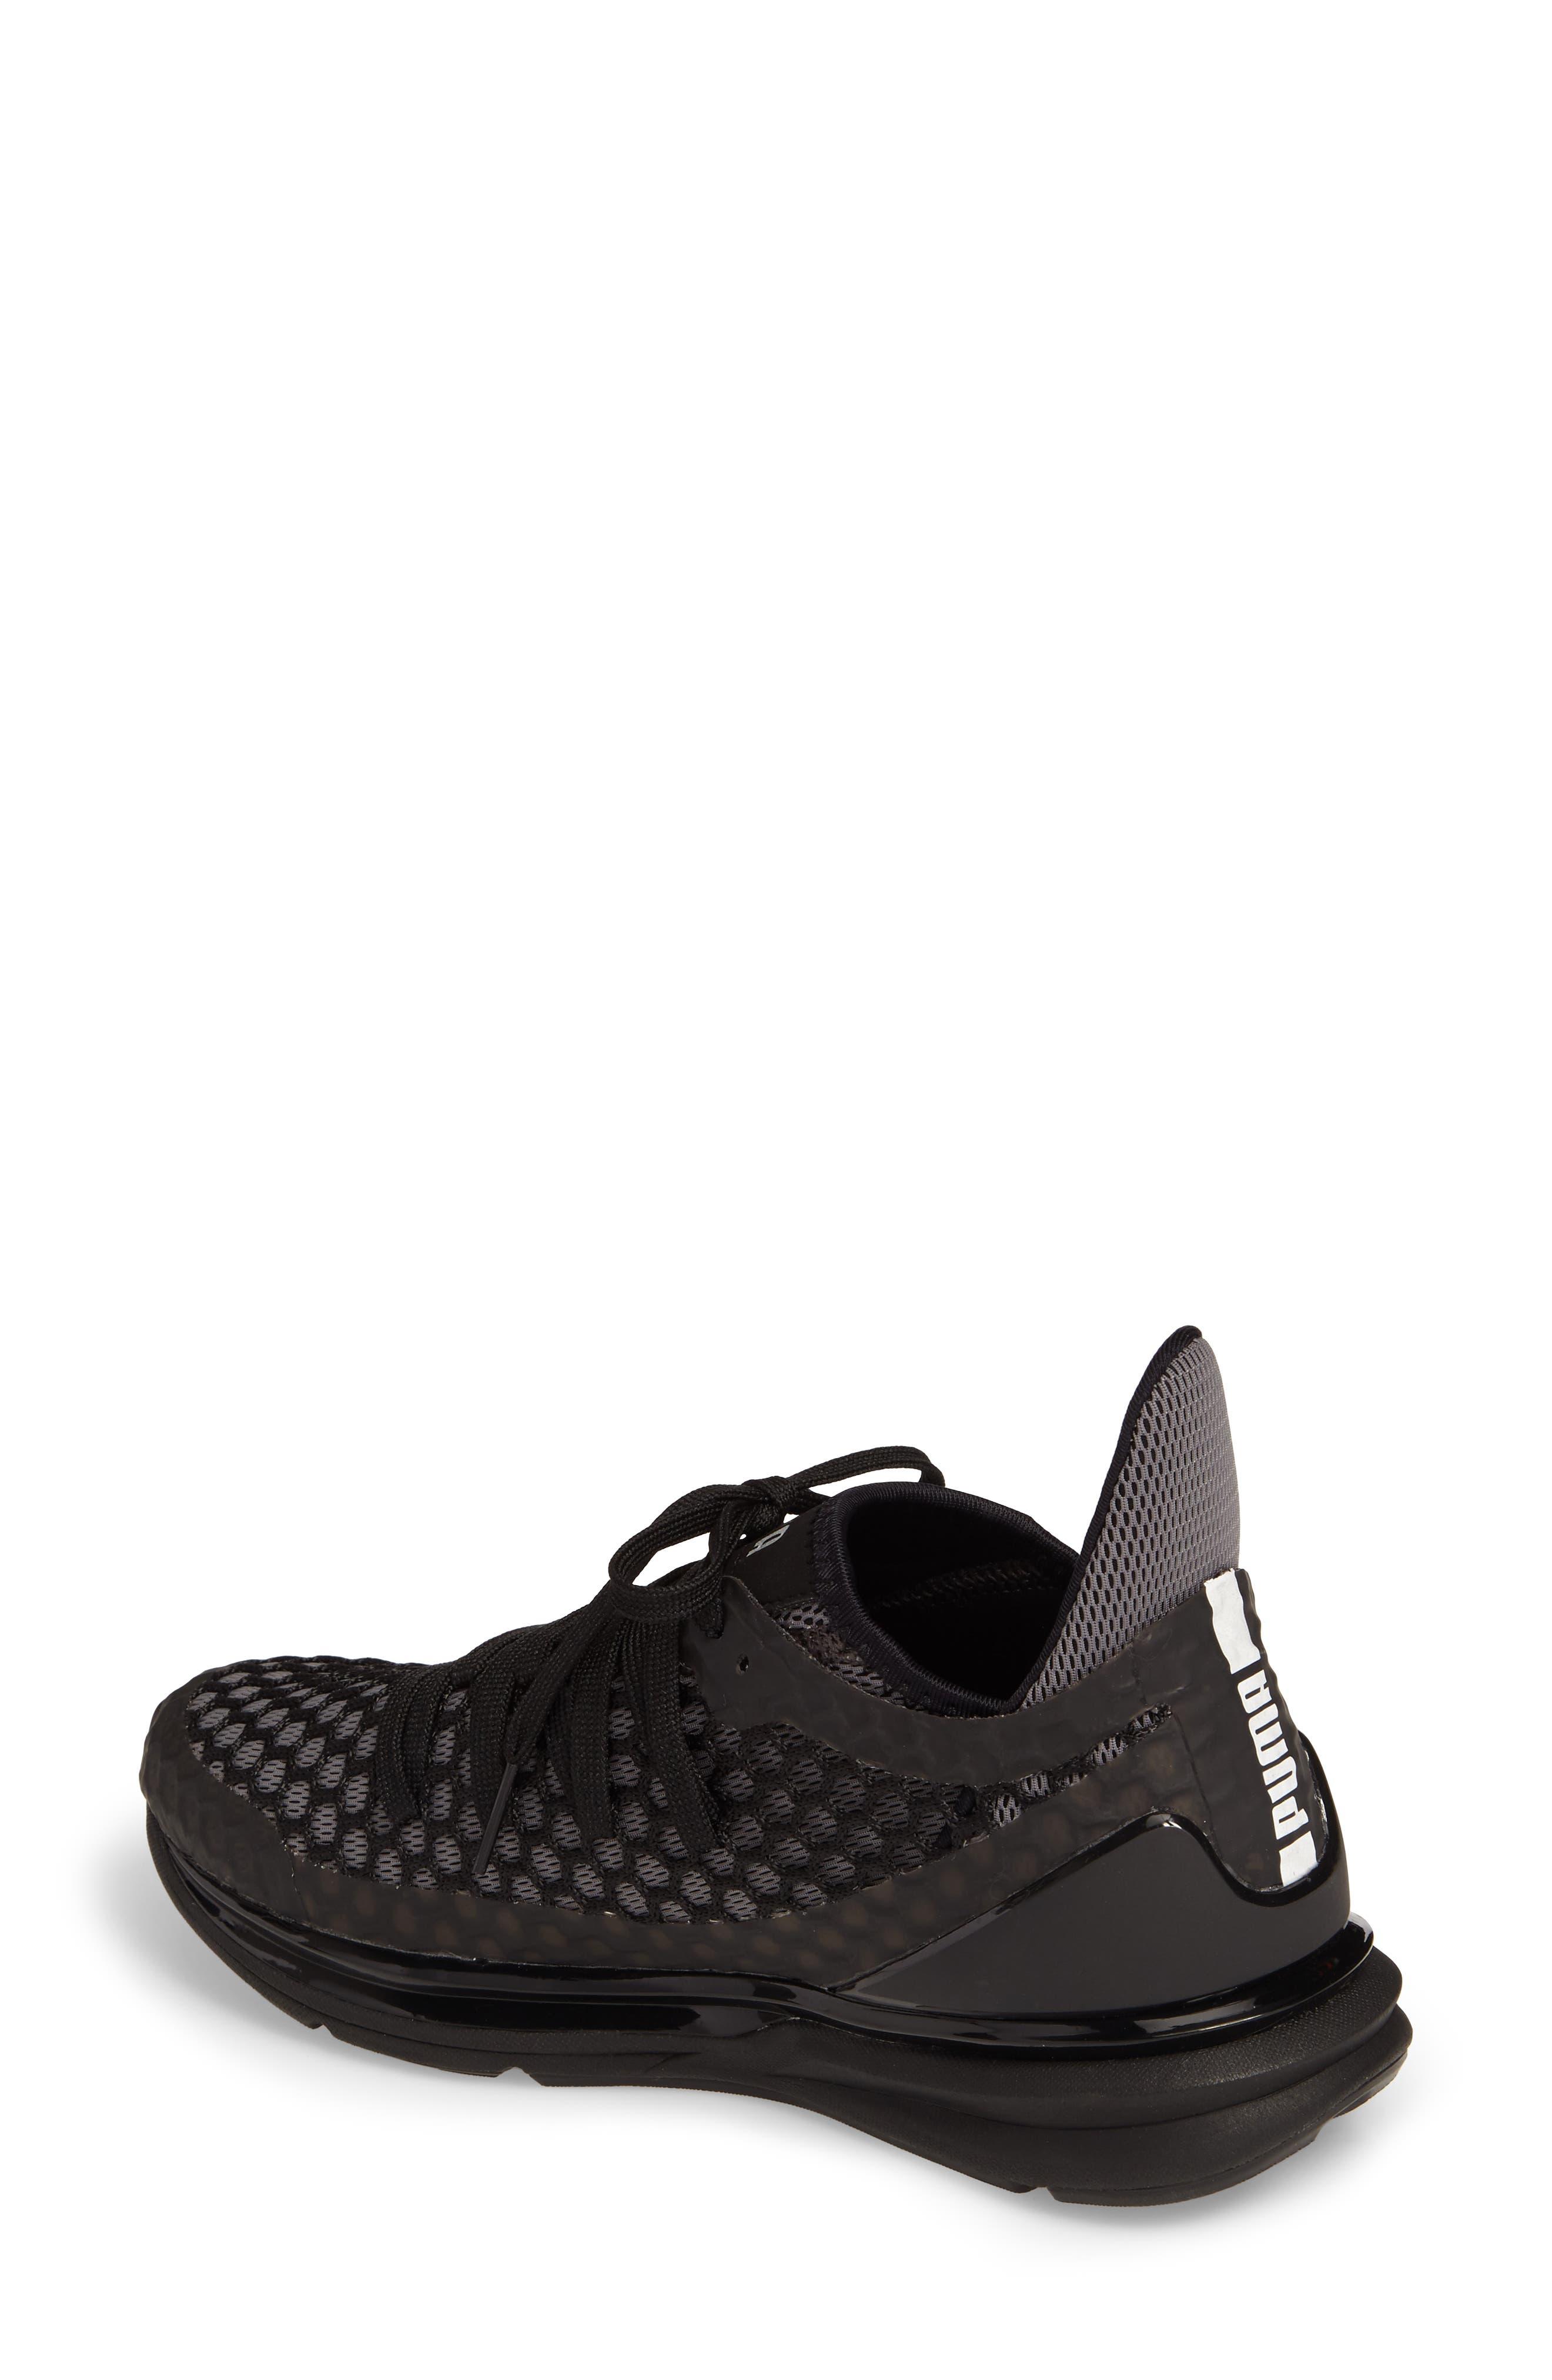 Ignite Limitless Netfit Running Shoe,                             Alternate thumbnail 2, color,                             Black/ Silver